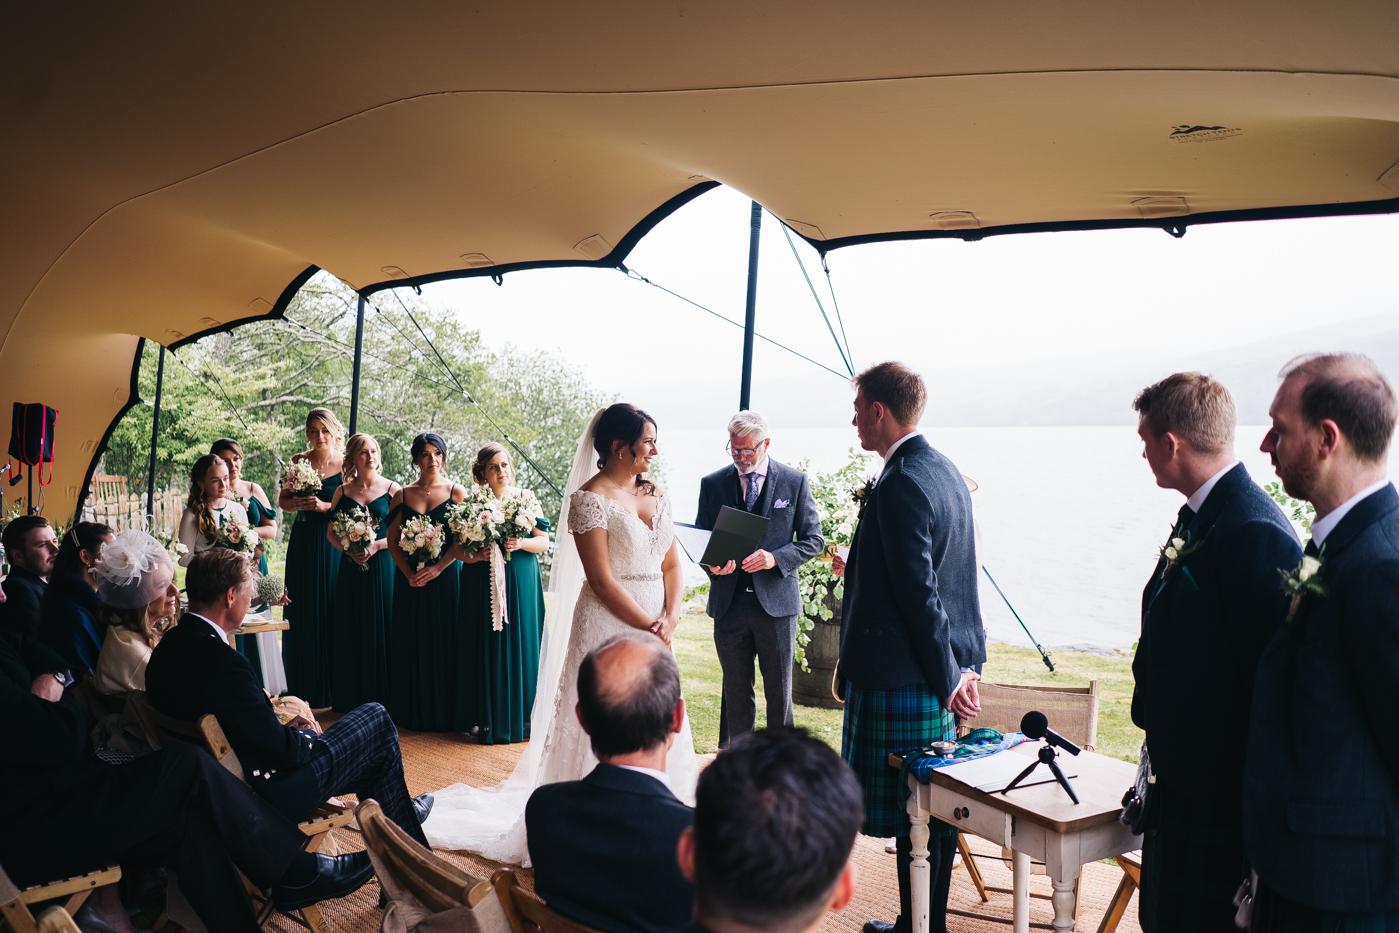 scottish-wedding-trossachs-loch-tay-highlannds-relaxed-photography-photographer-0019.jpg